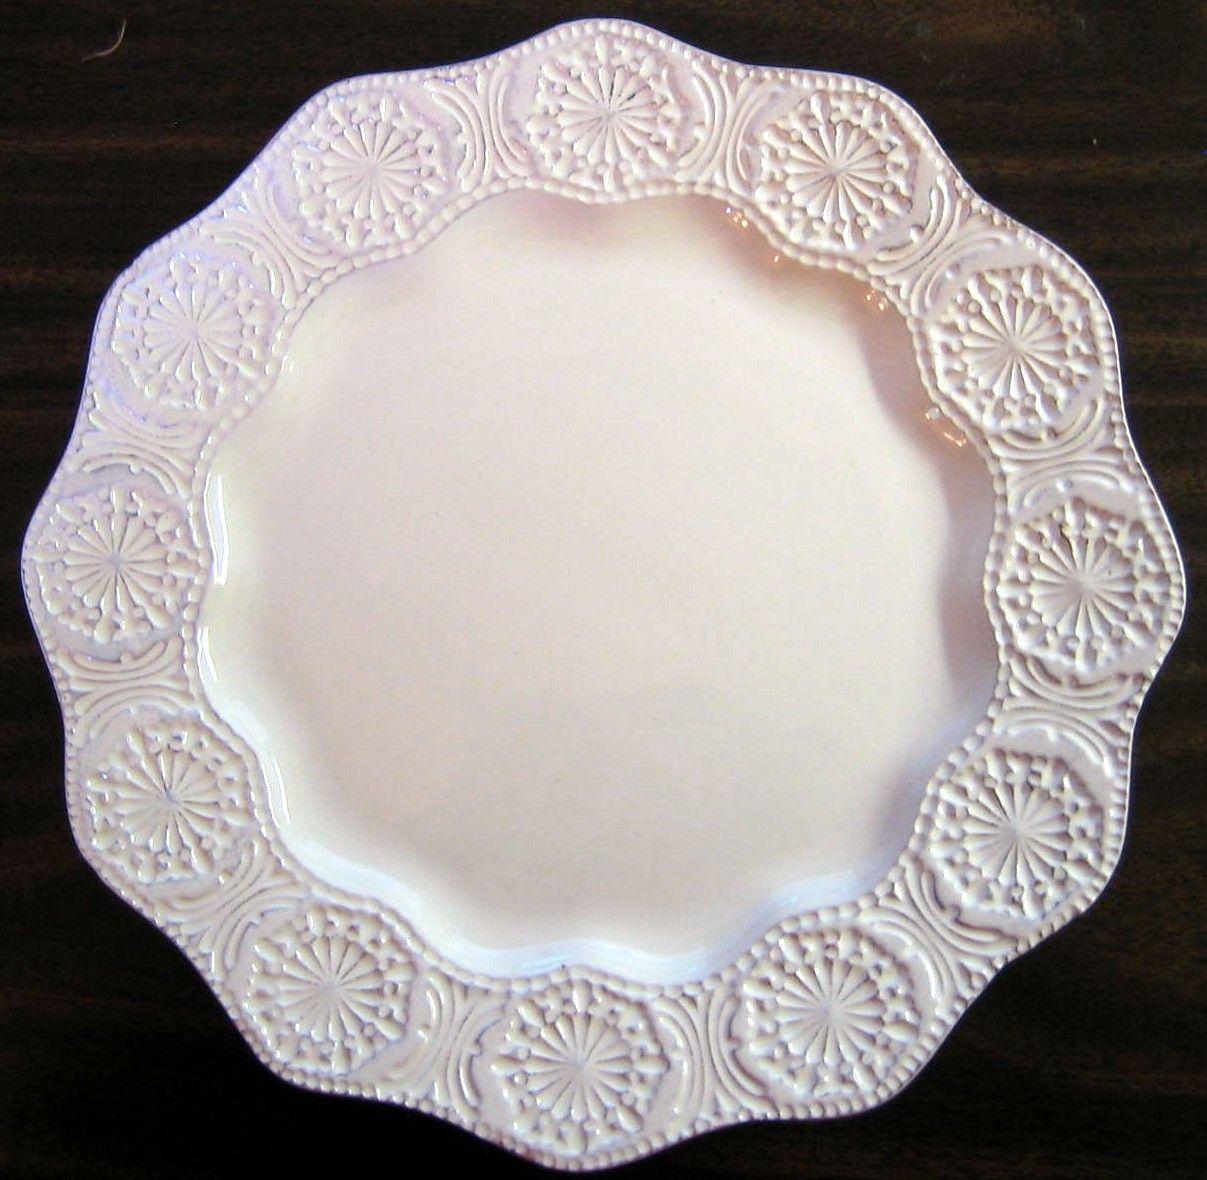 Decorative Plate ... & Decorative Plate - Cream Pottery Textured Medallion Wavy Edge Large ...